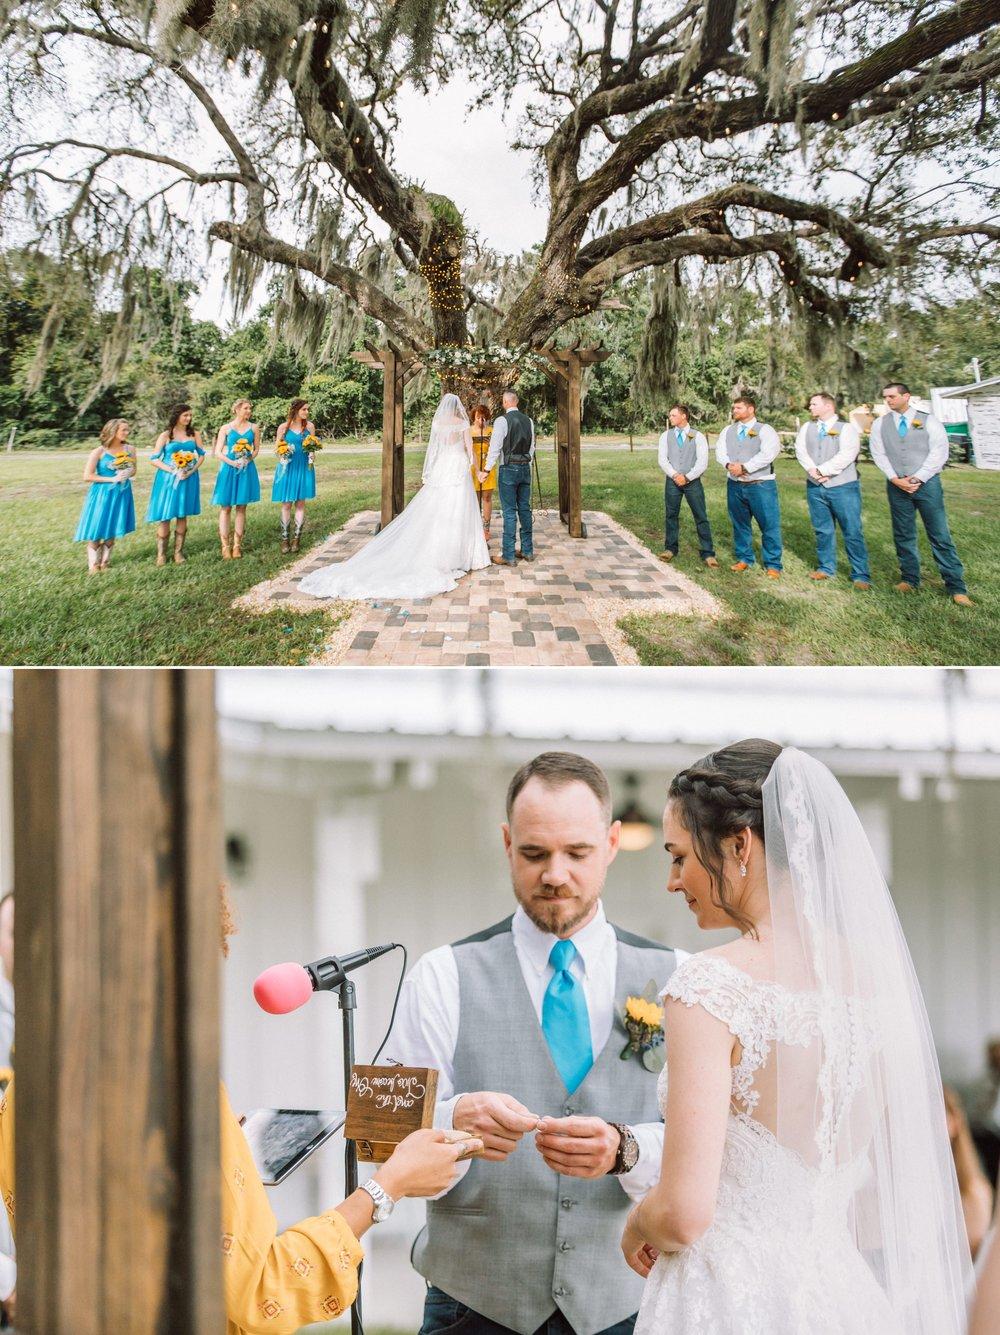 Rustic Sunflower & Blueberry Barn Wedding- Ever After Farms - Allie & NickBlog 25.jpg